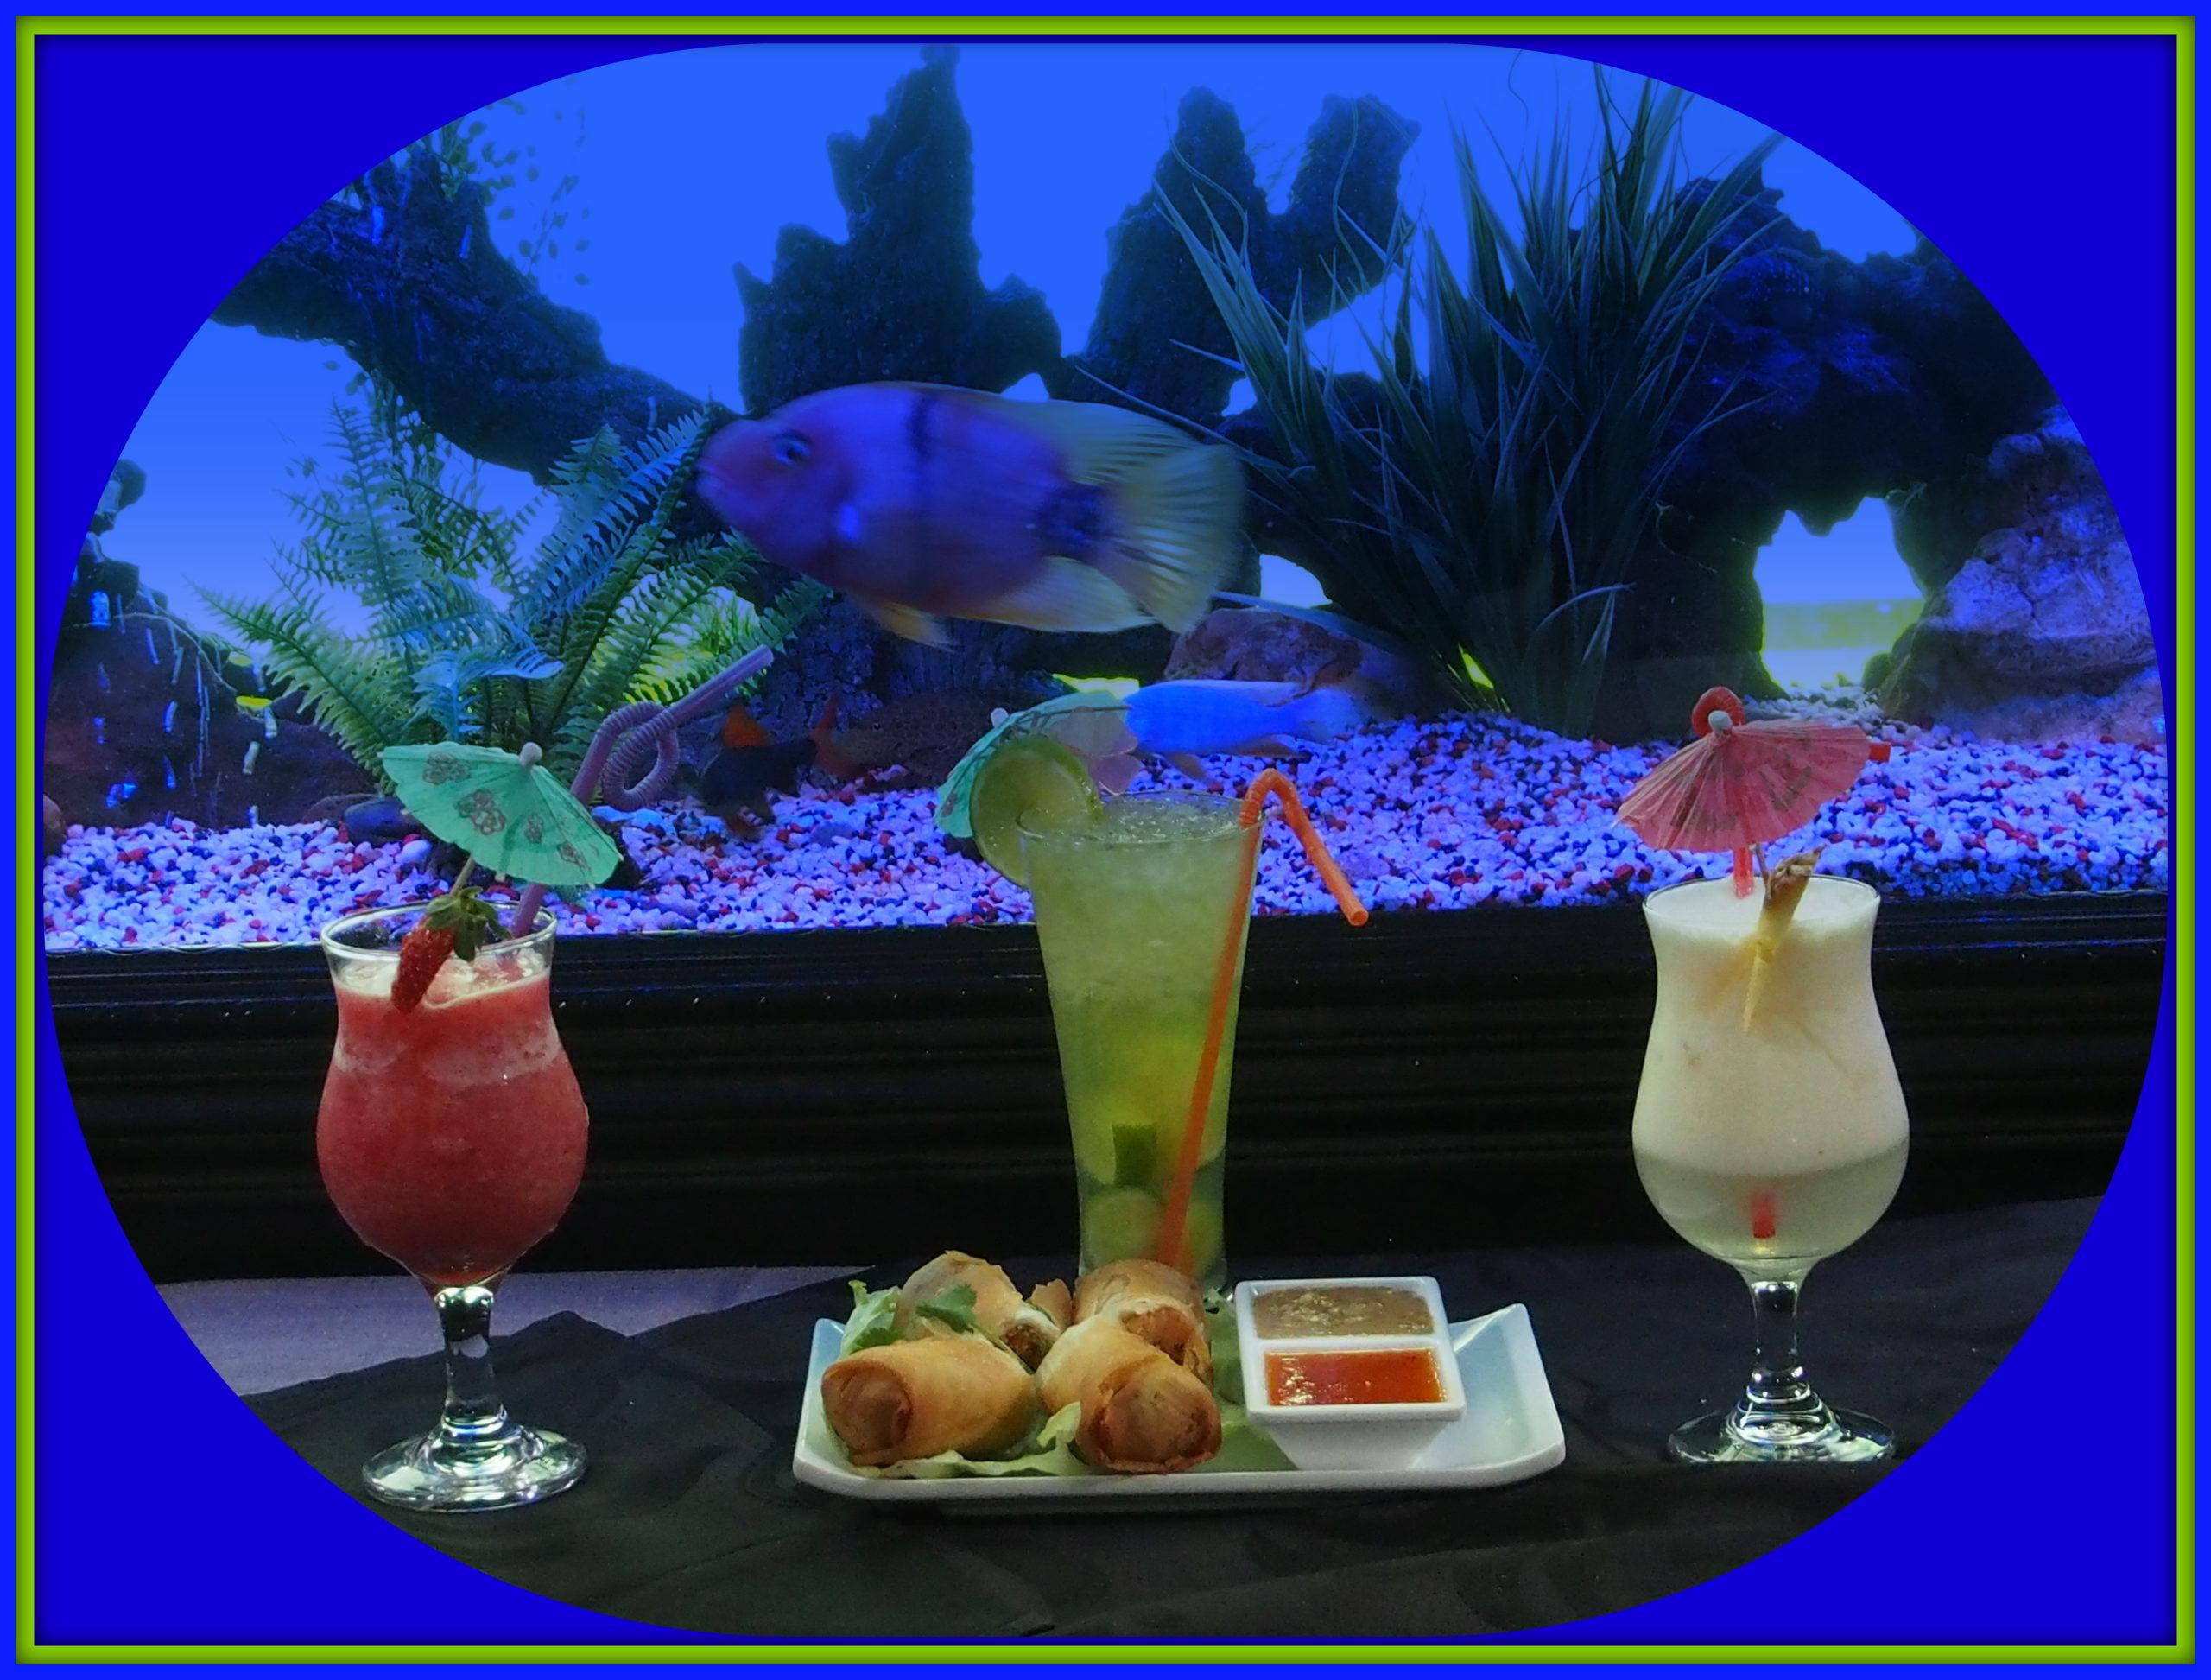 randburg restaurant fusionista asian - cocktails by the fish tank